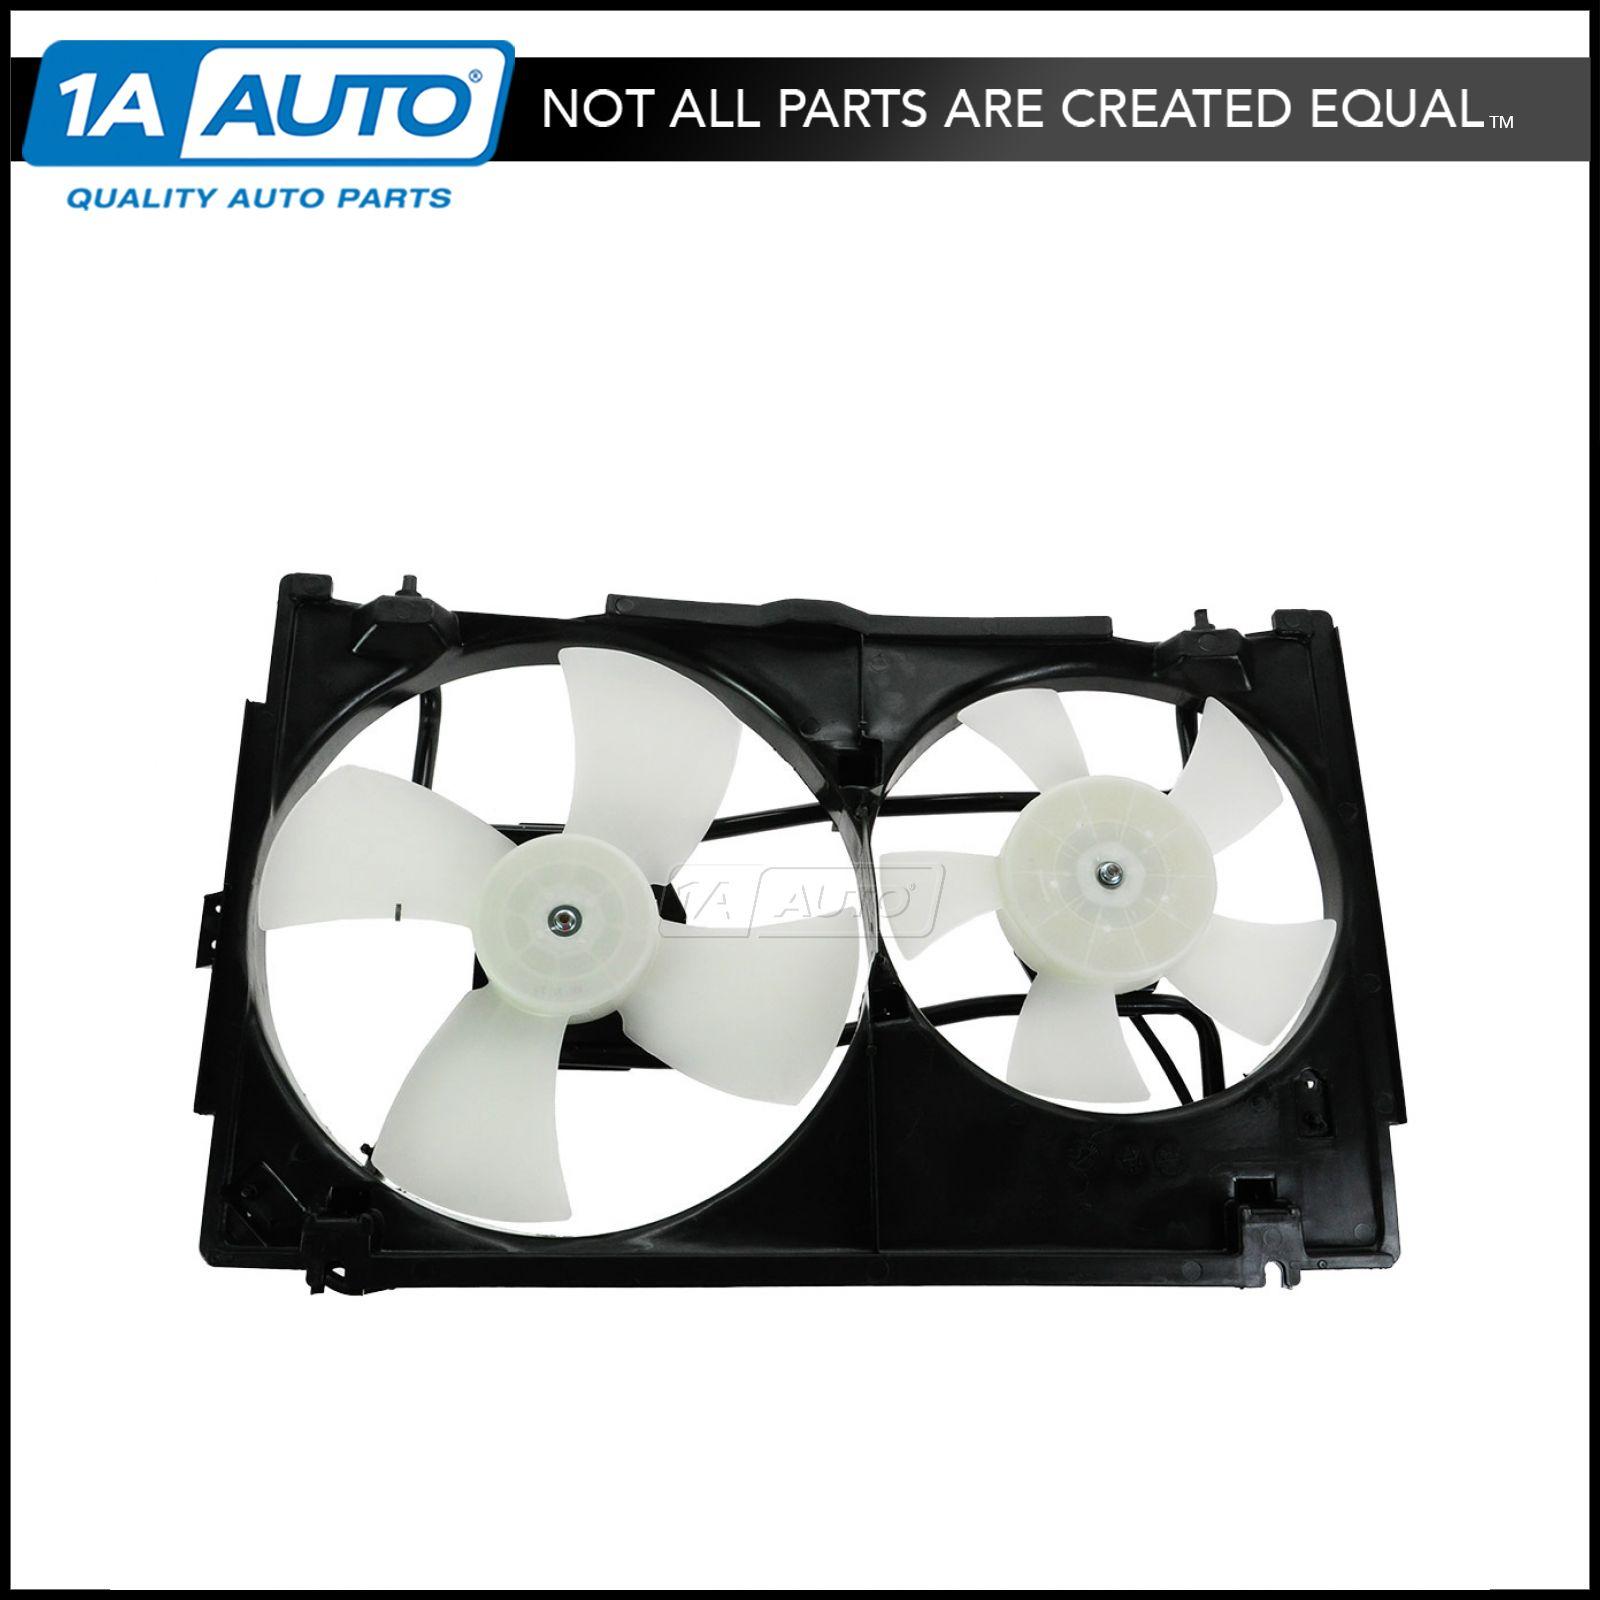 Radiator Cooling Fan Assembly w// Motor for 07-12 Nissan Sentra 2.0L